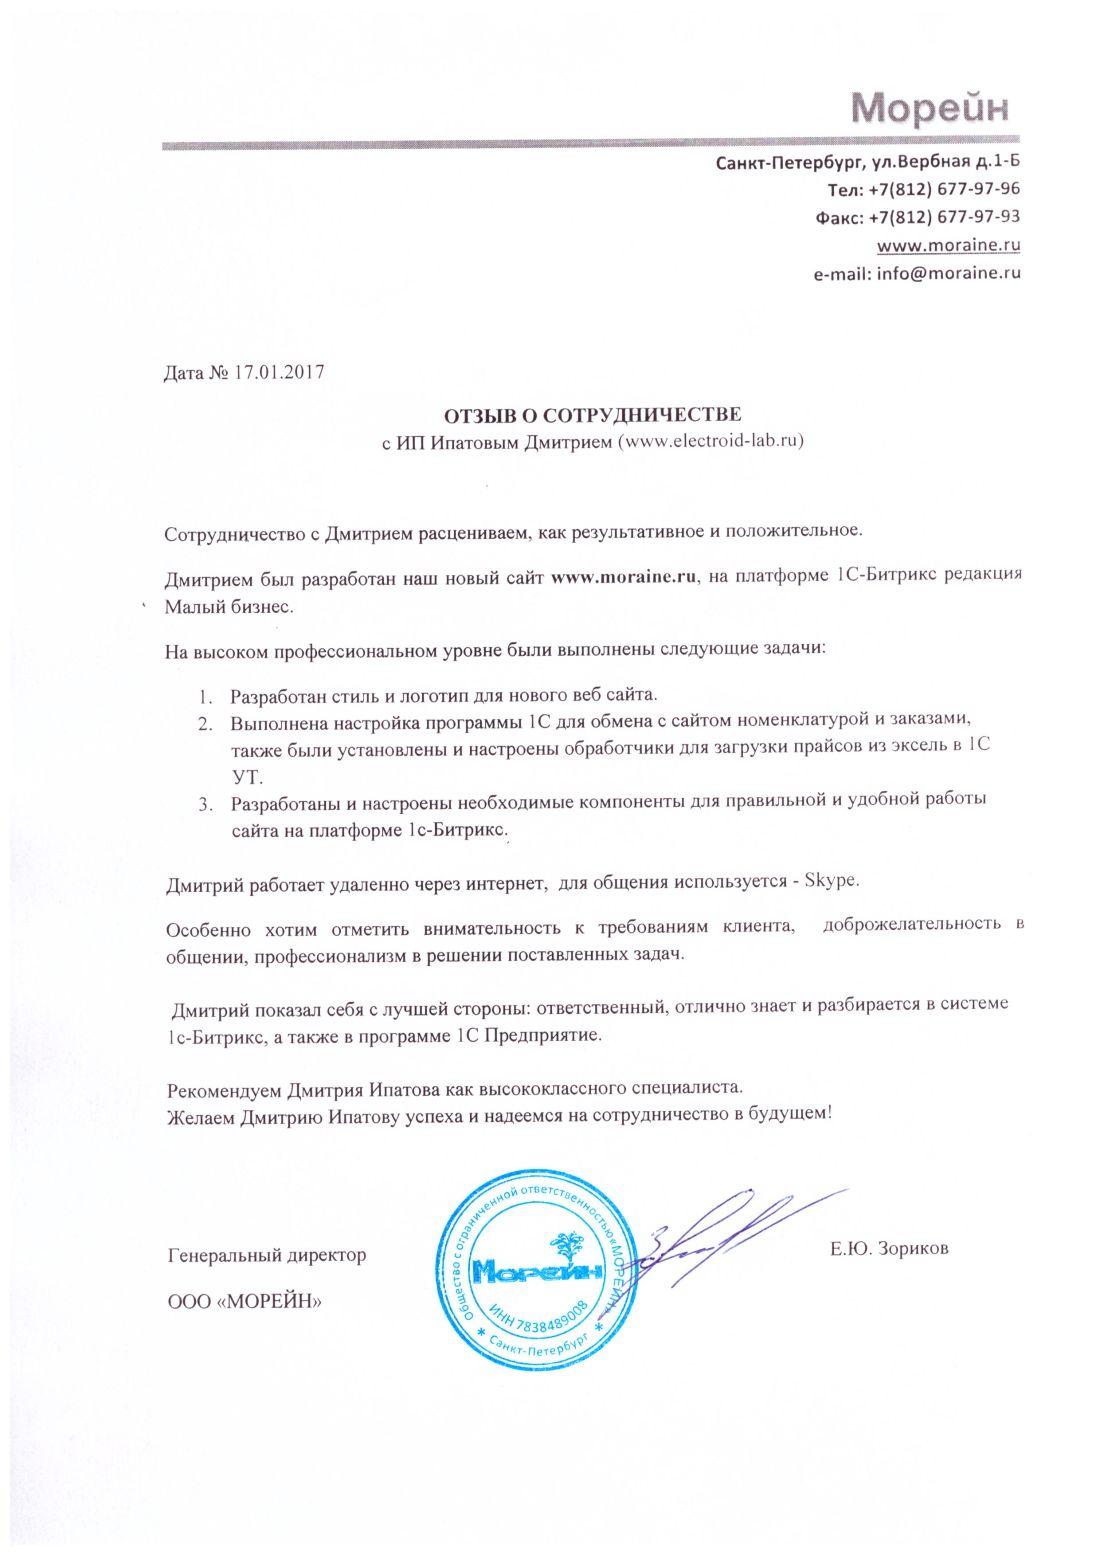 Отзыв о сотрудничестве от ООО МОРЕЙН